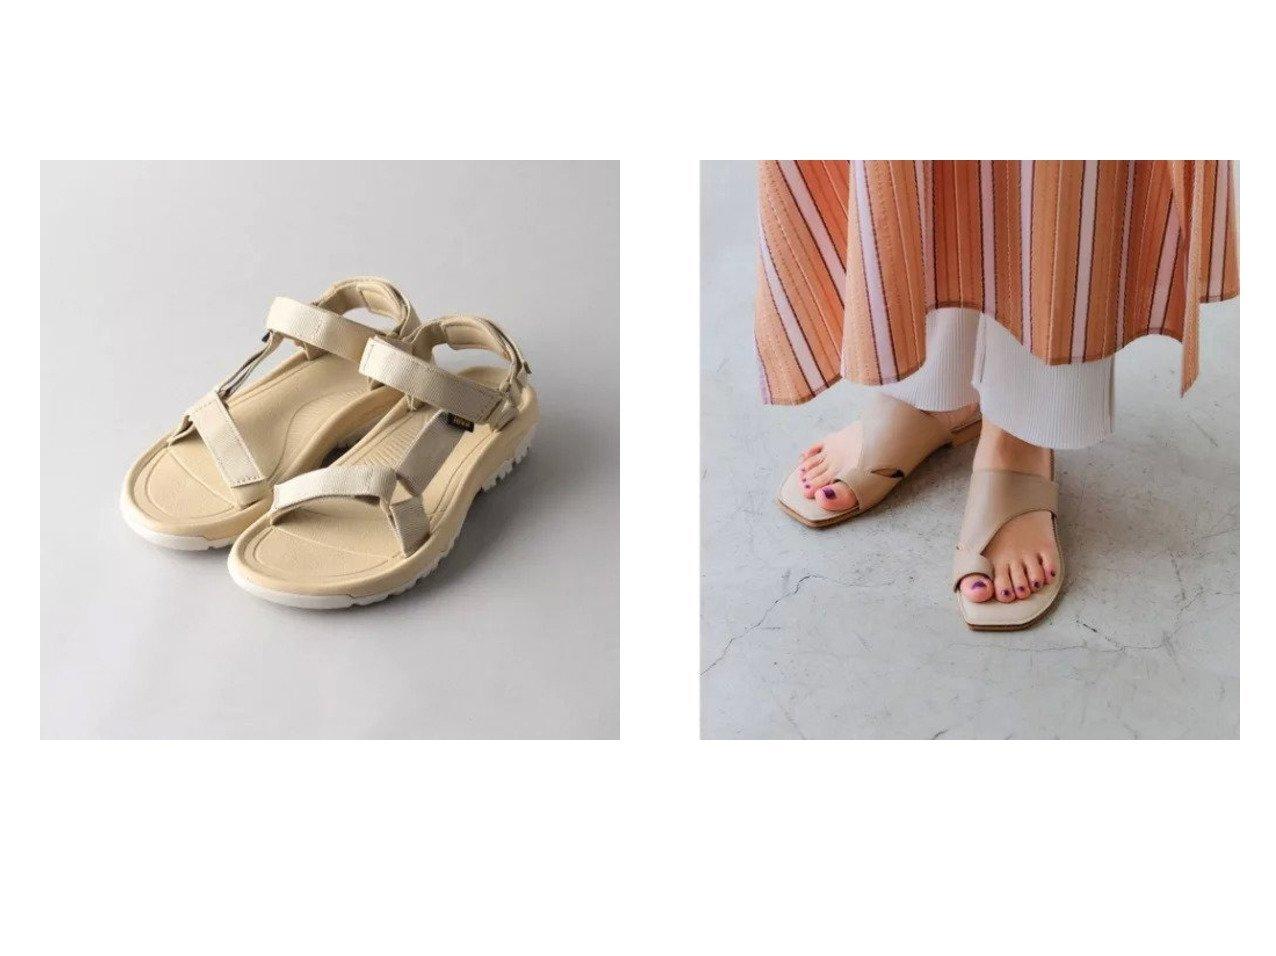 【green label relaxing / UNITED ARROWS/グリーンレーベル リラクシング / ユナイテッドアローズ】のCFC スクエア トング サンダル (1.5cmヒール)&【Odette e Odile/オデット エ オディール】のTEVA HURRICANE XLT2 【シューズ・靴】おすすめ!人気、トレンド・レディースファッションの通販 おすすめで人気の流行・トレンド、ファッションの通販商品 メンズファッション・キッズファッション・インテリア・家具・レディースファッション・服の通販 founy(ファニー) https://founy.com/ ファッション Fashion レディースファッション WOMEN サンダル シューズ シンプル スクエア セットアップ フィット リラックス S/S・春夏 SS・Spring/Summer アウトドア スポーツ ソックス 人気 定番 Standard 春 Spring  ID:crp329100000030398